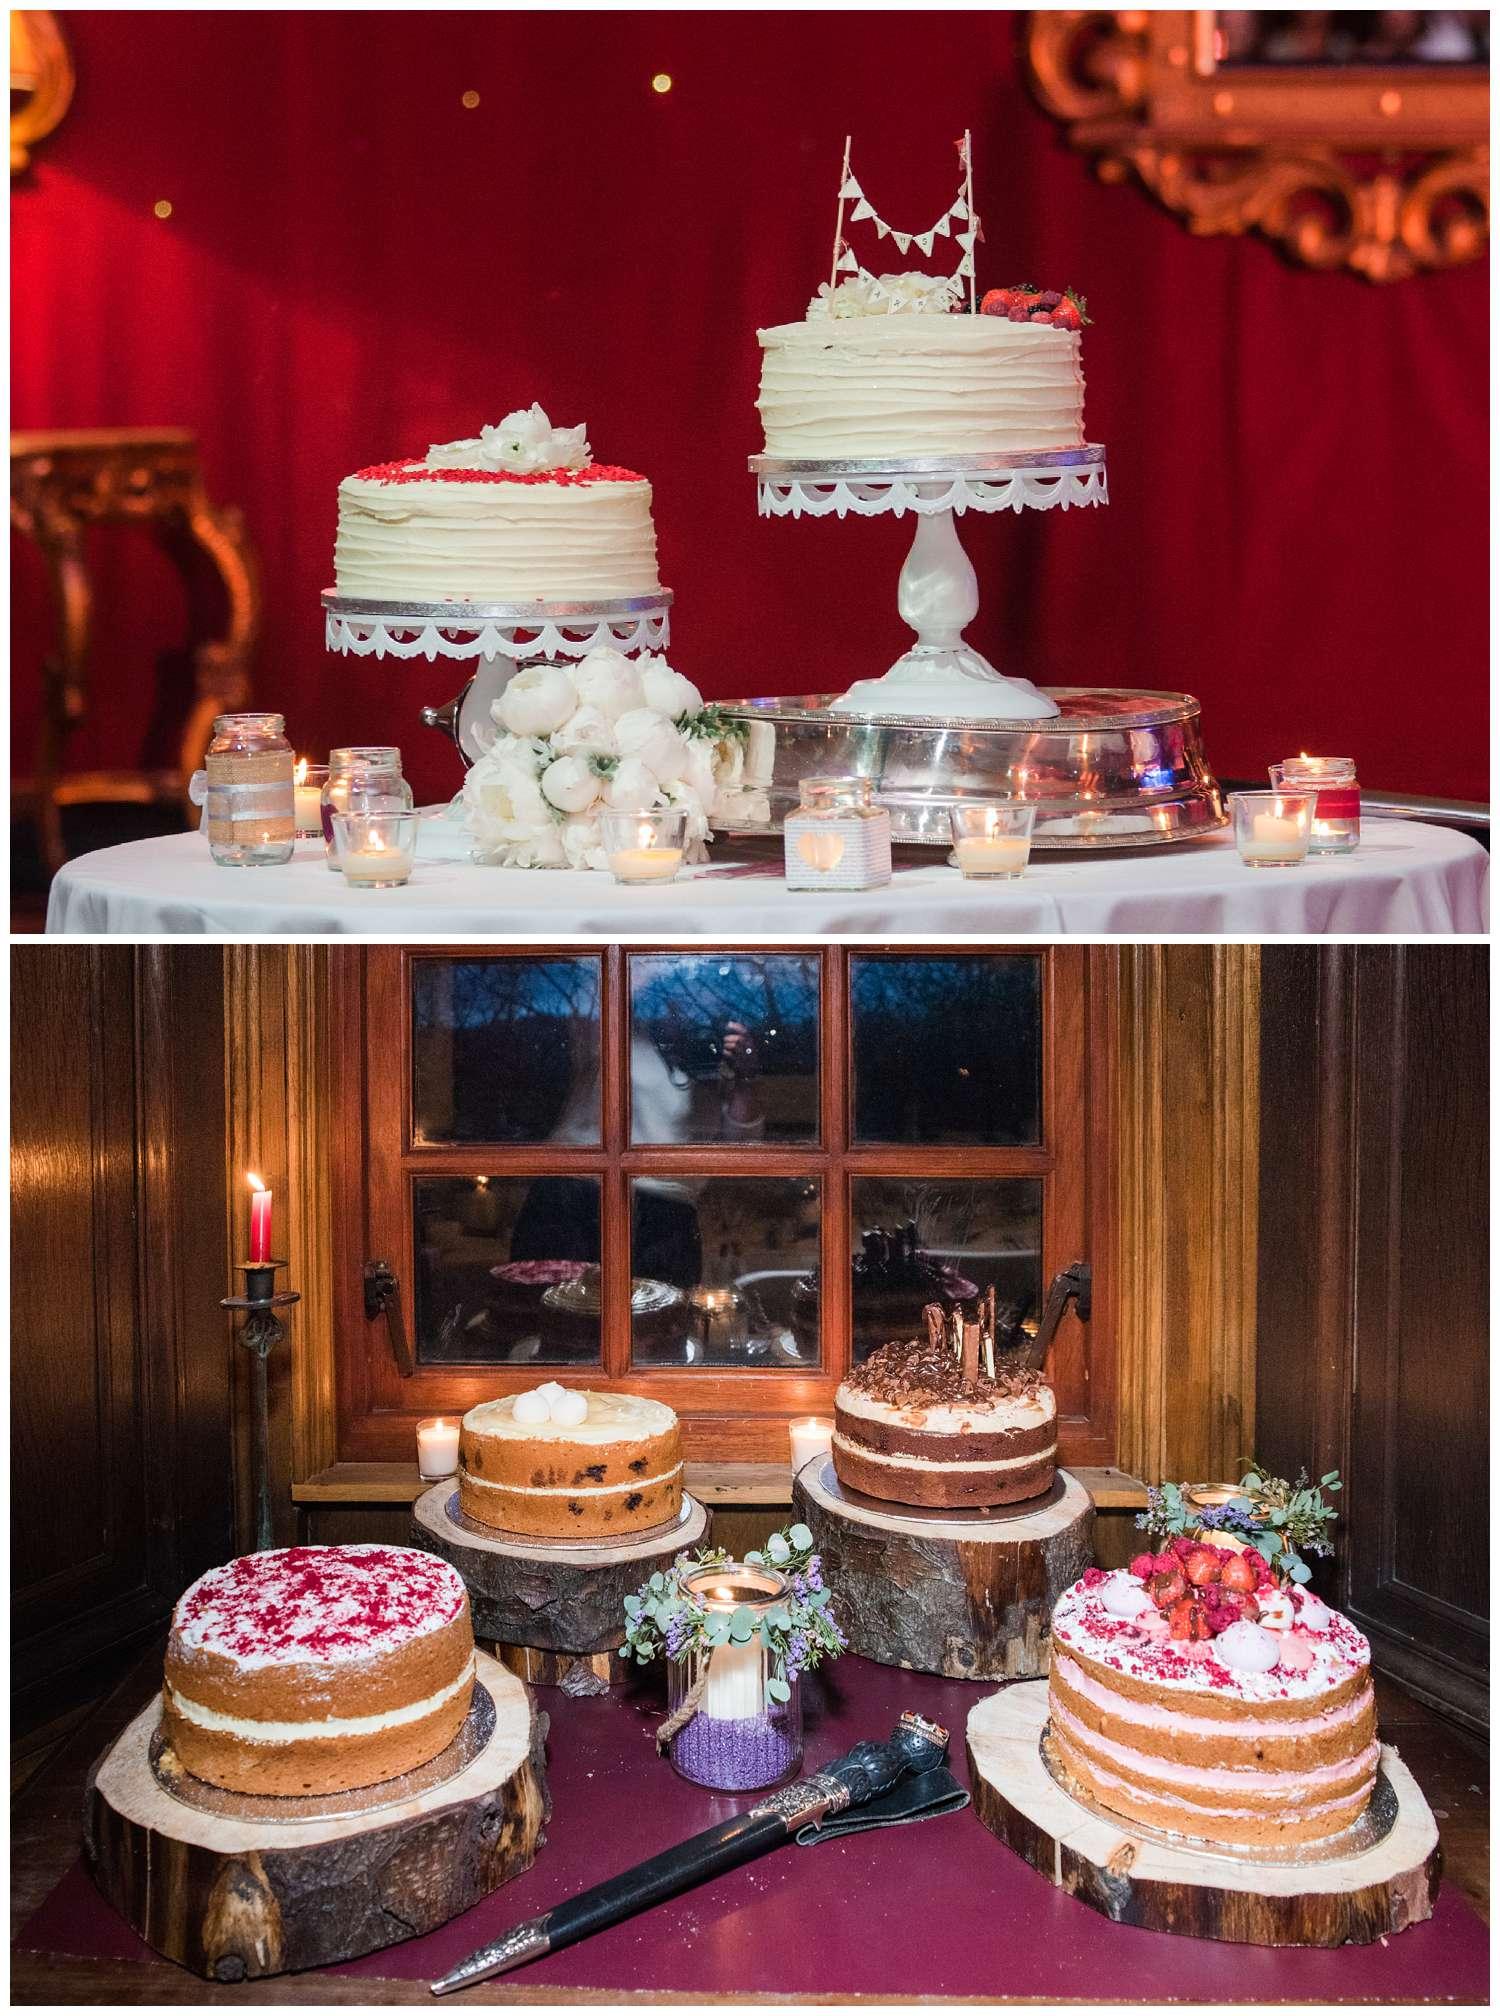 Individual wedding cake ideas, ideas for your wedding cake